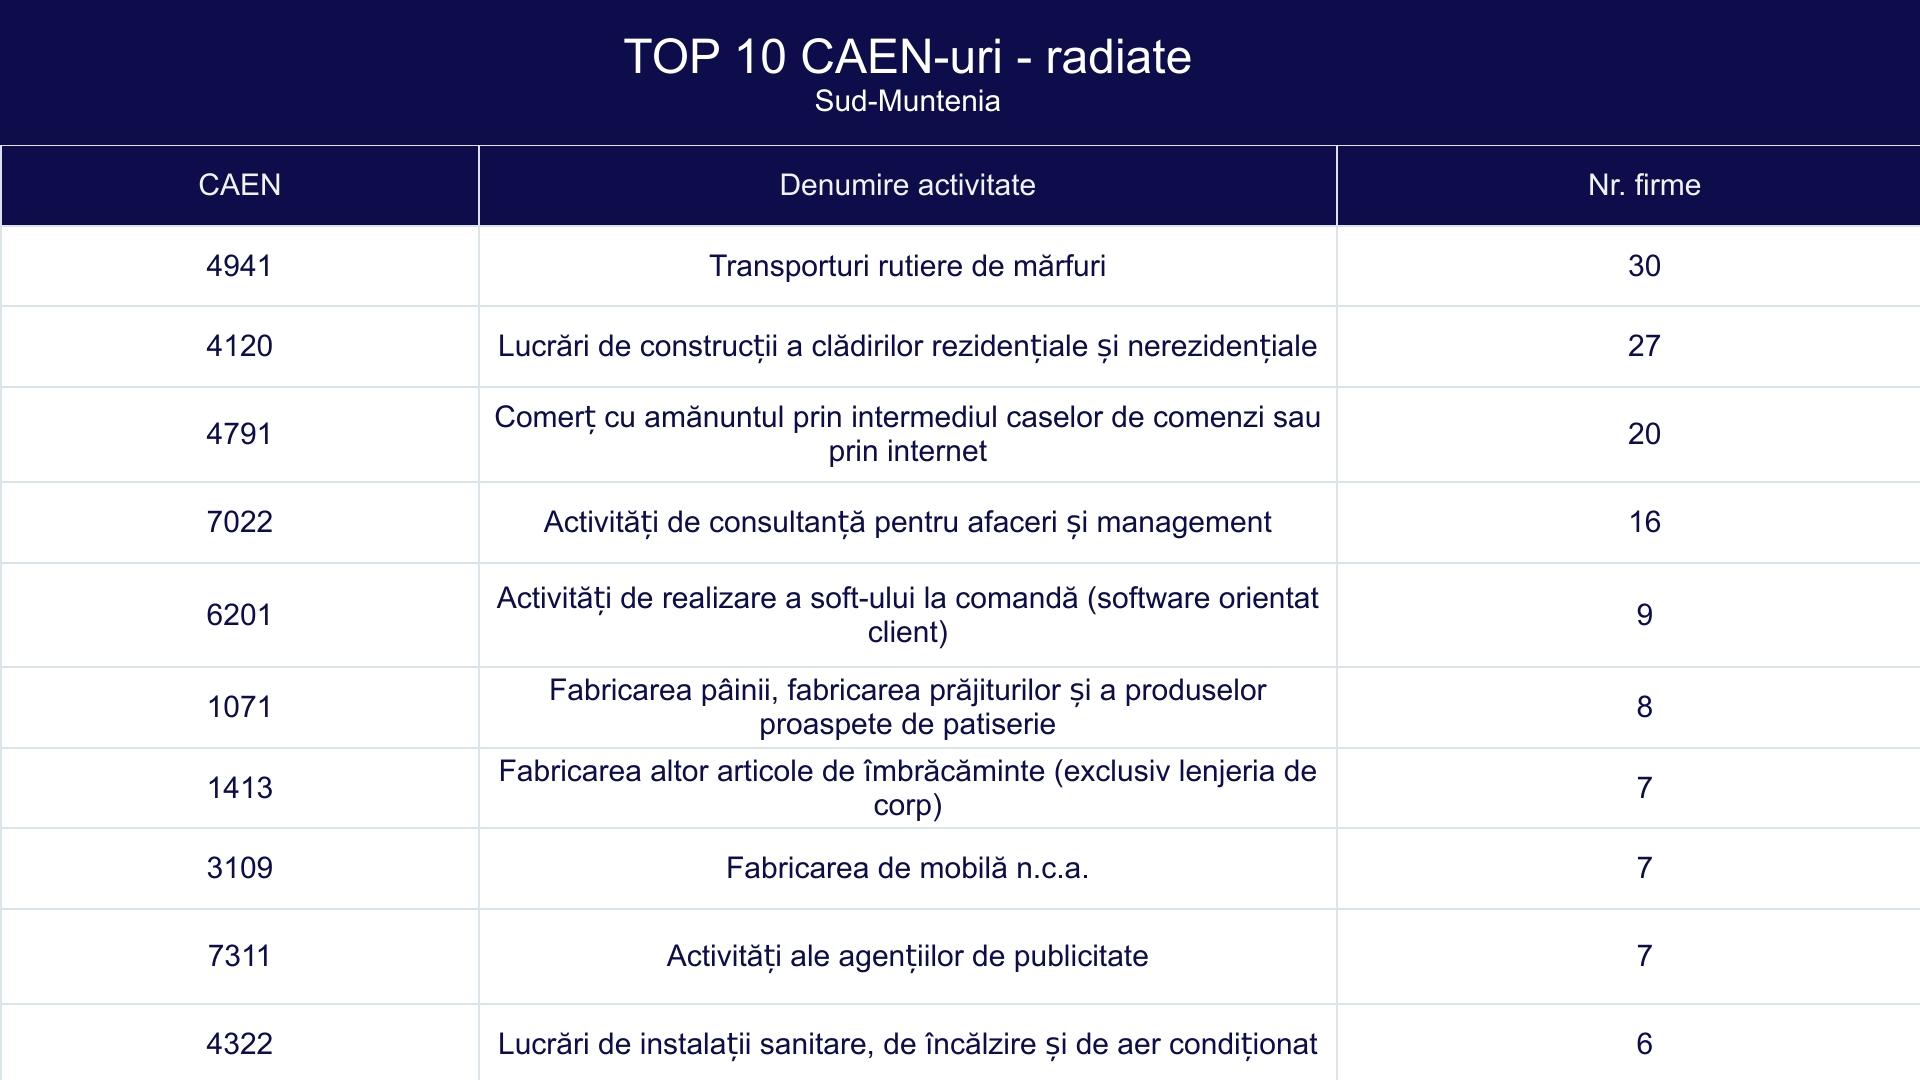 TOP 10 CAEN-uri - radiate - Sud-Muntenia